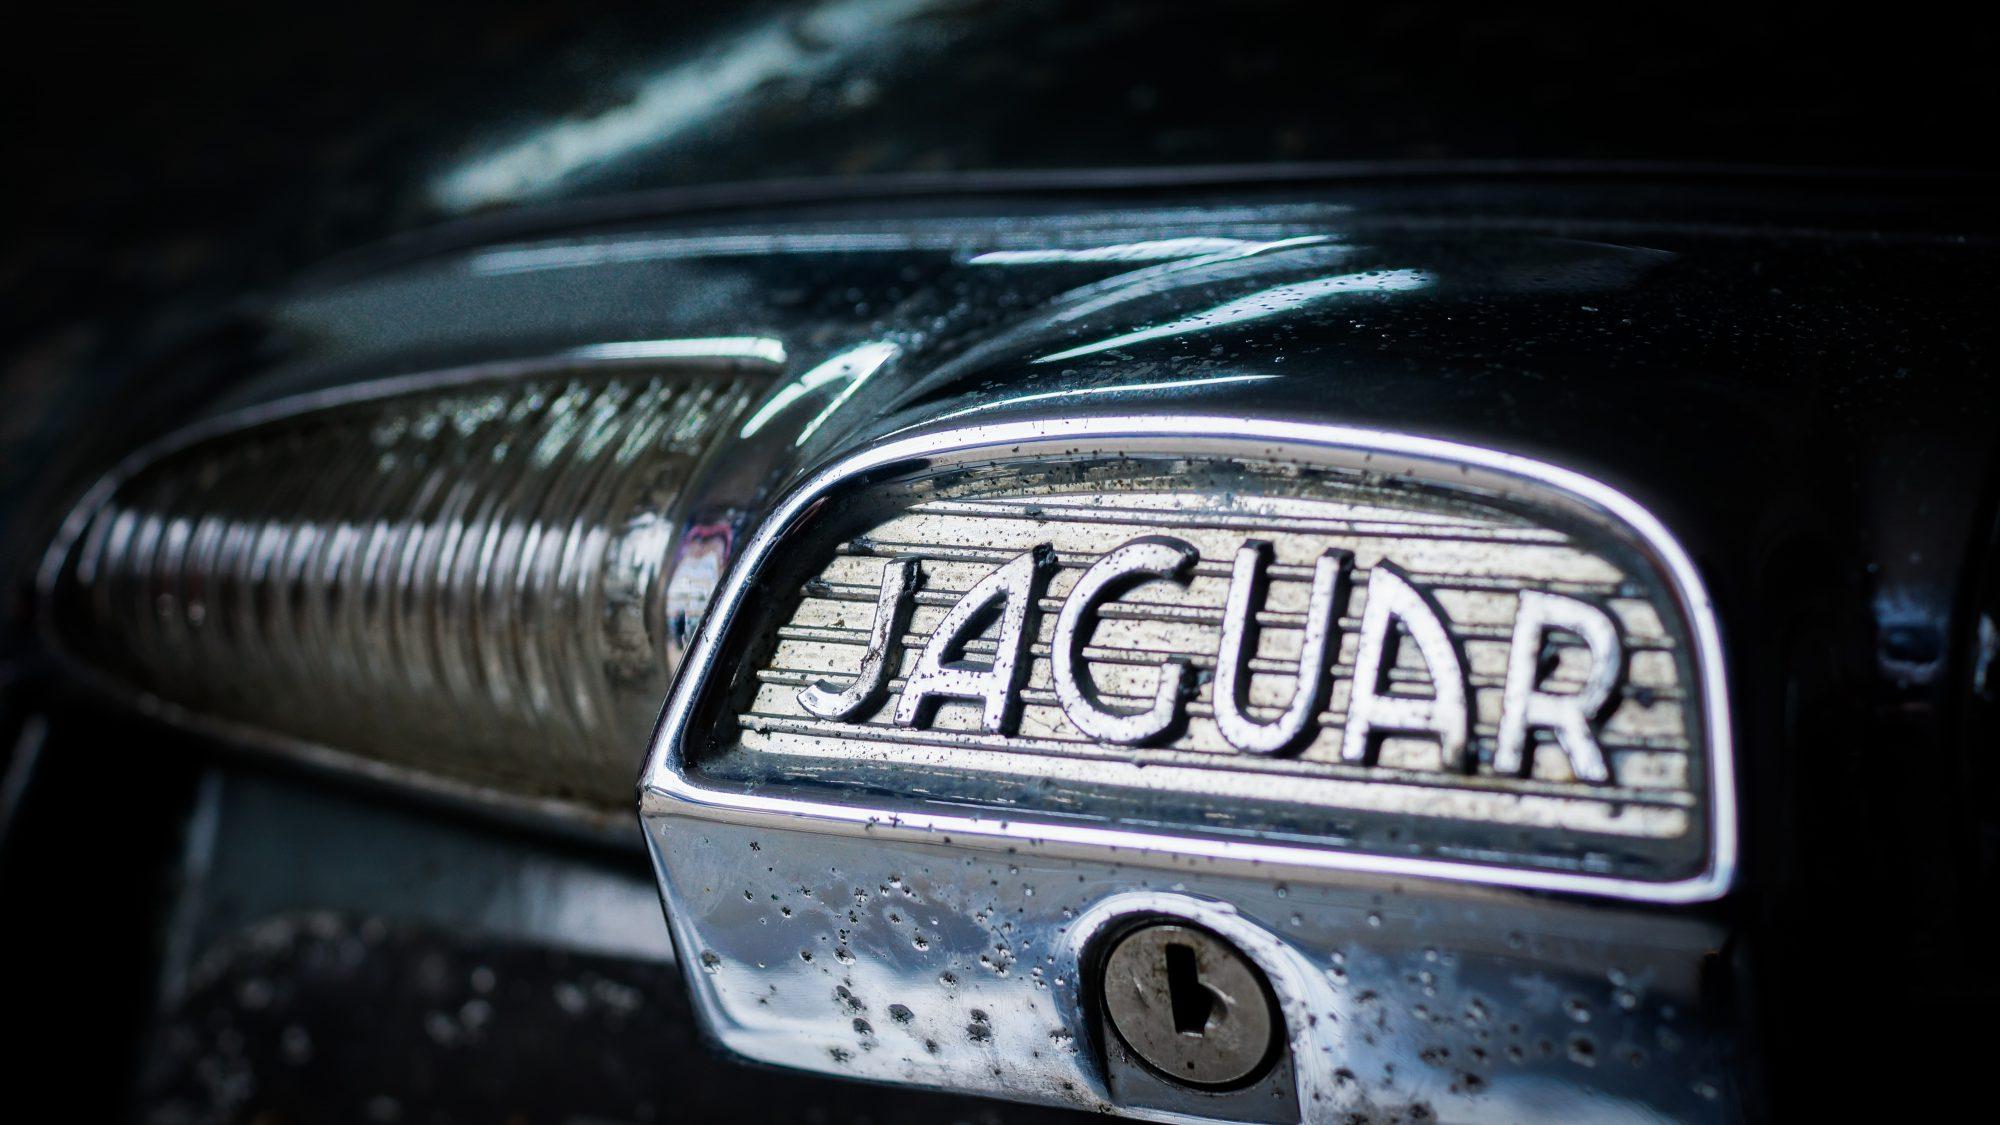 Jaguar, Jaguar 420G, 420G, The Krays, Ronnie and Reggie Kray, Jaguar emblem